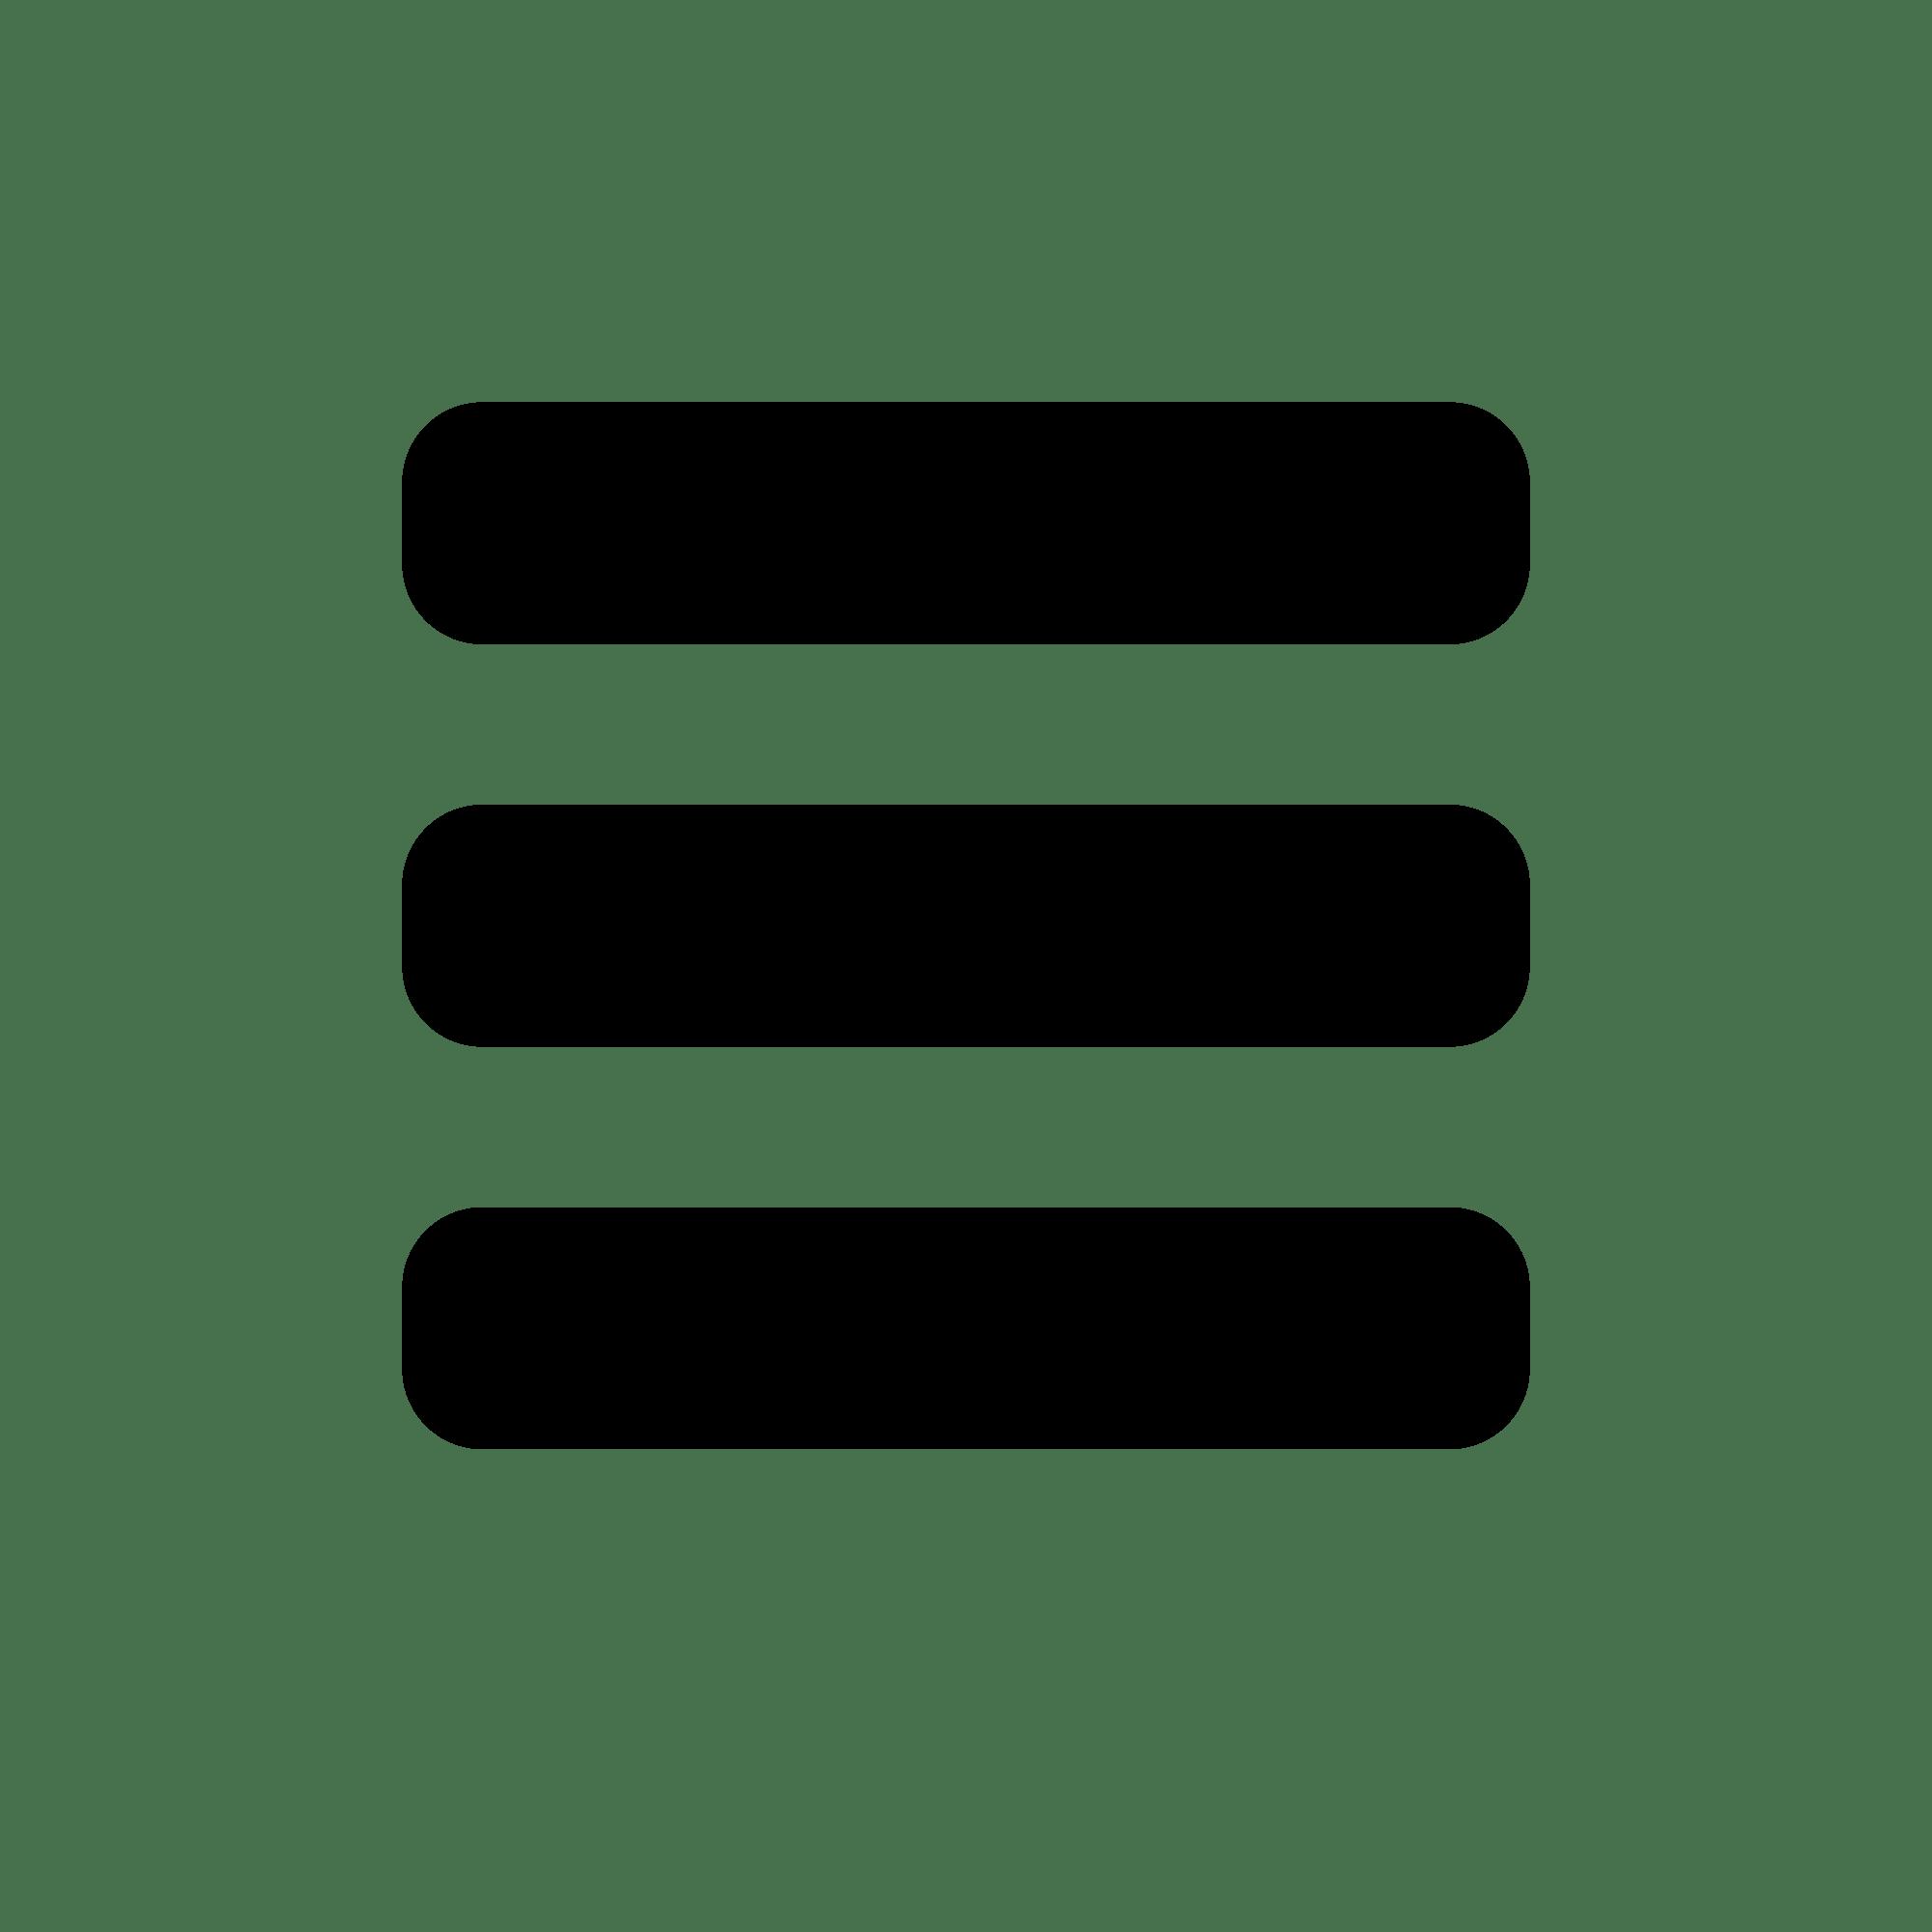 icons logos emojis · menu icons